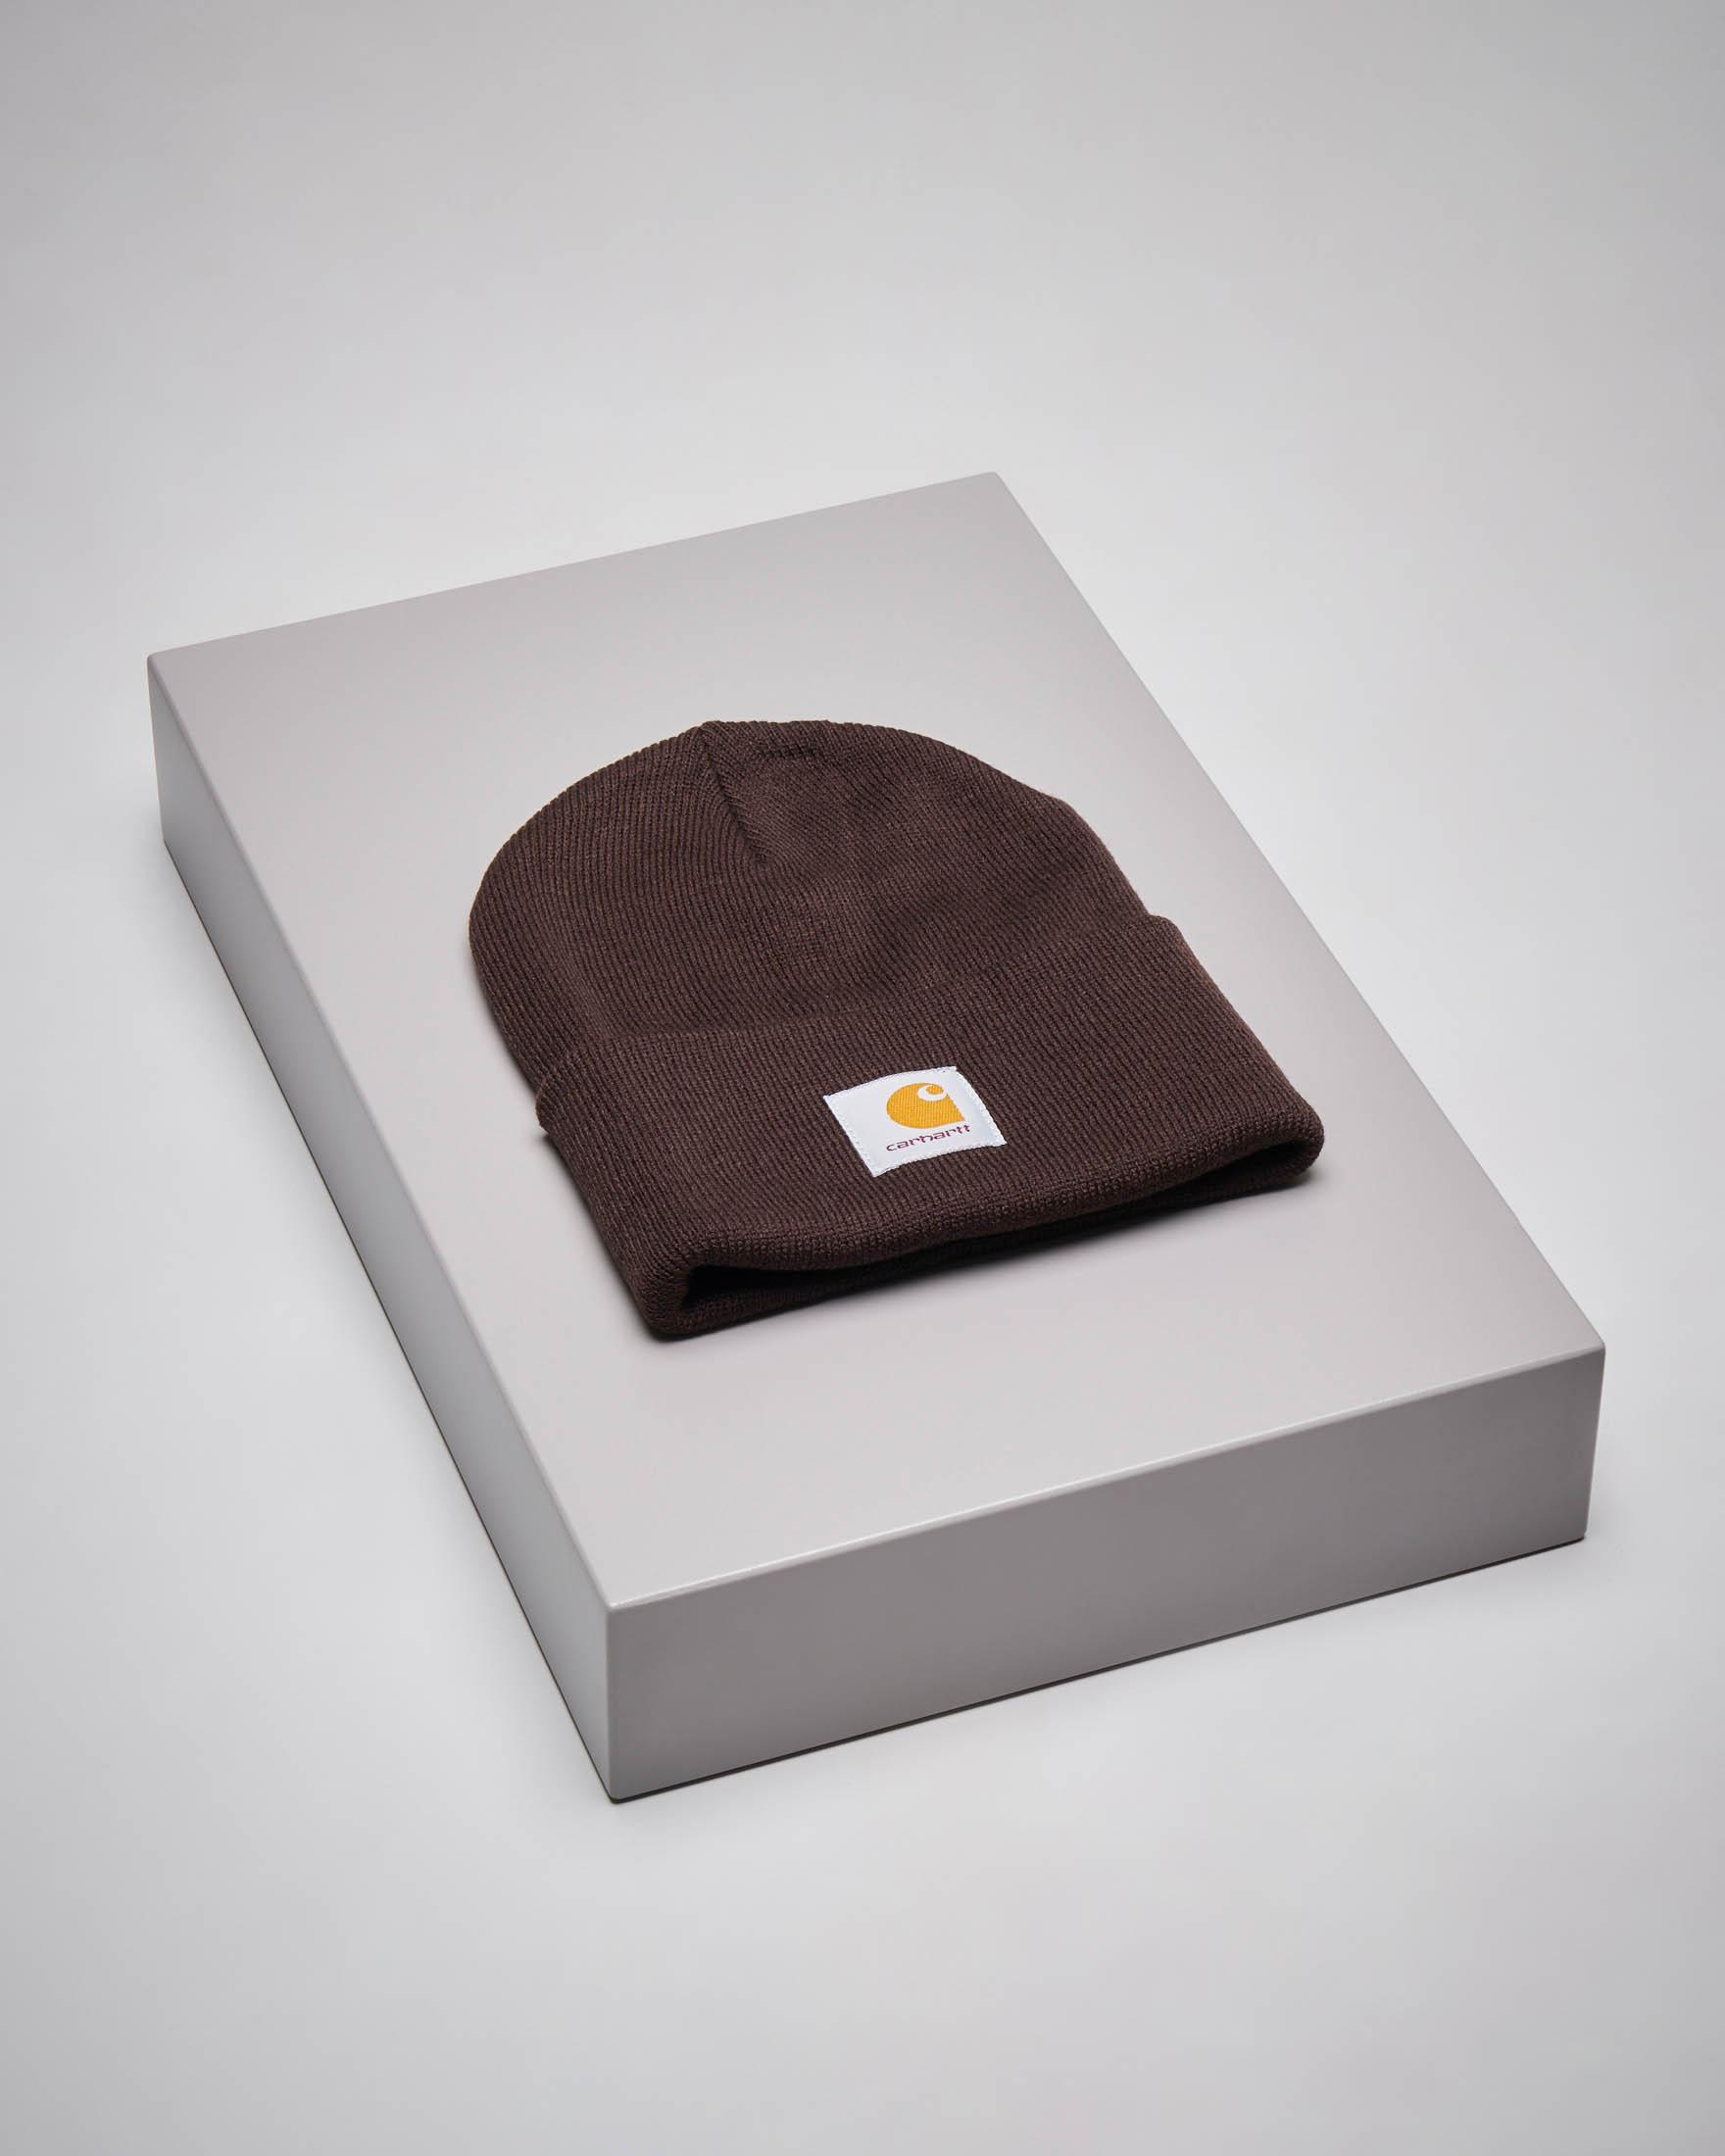 Berretto Acrylic Watch Hat marrone con logo